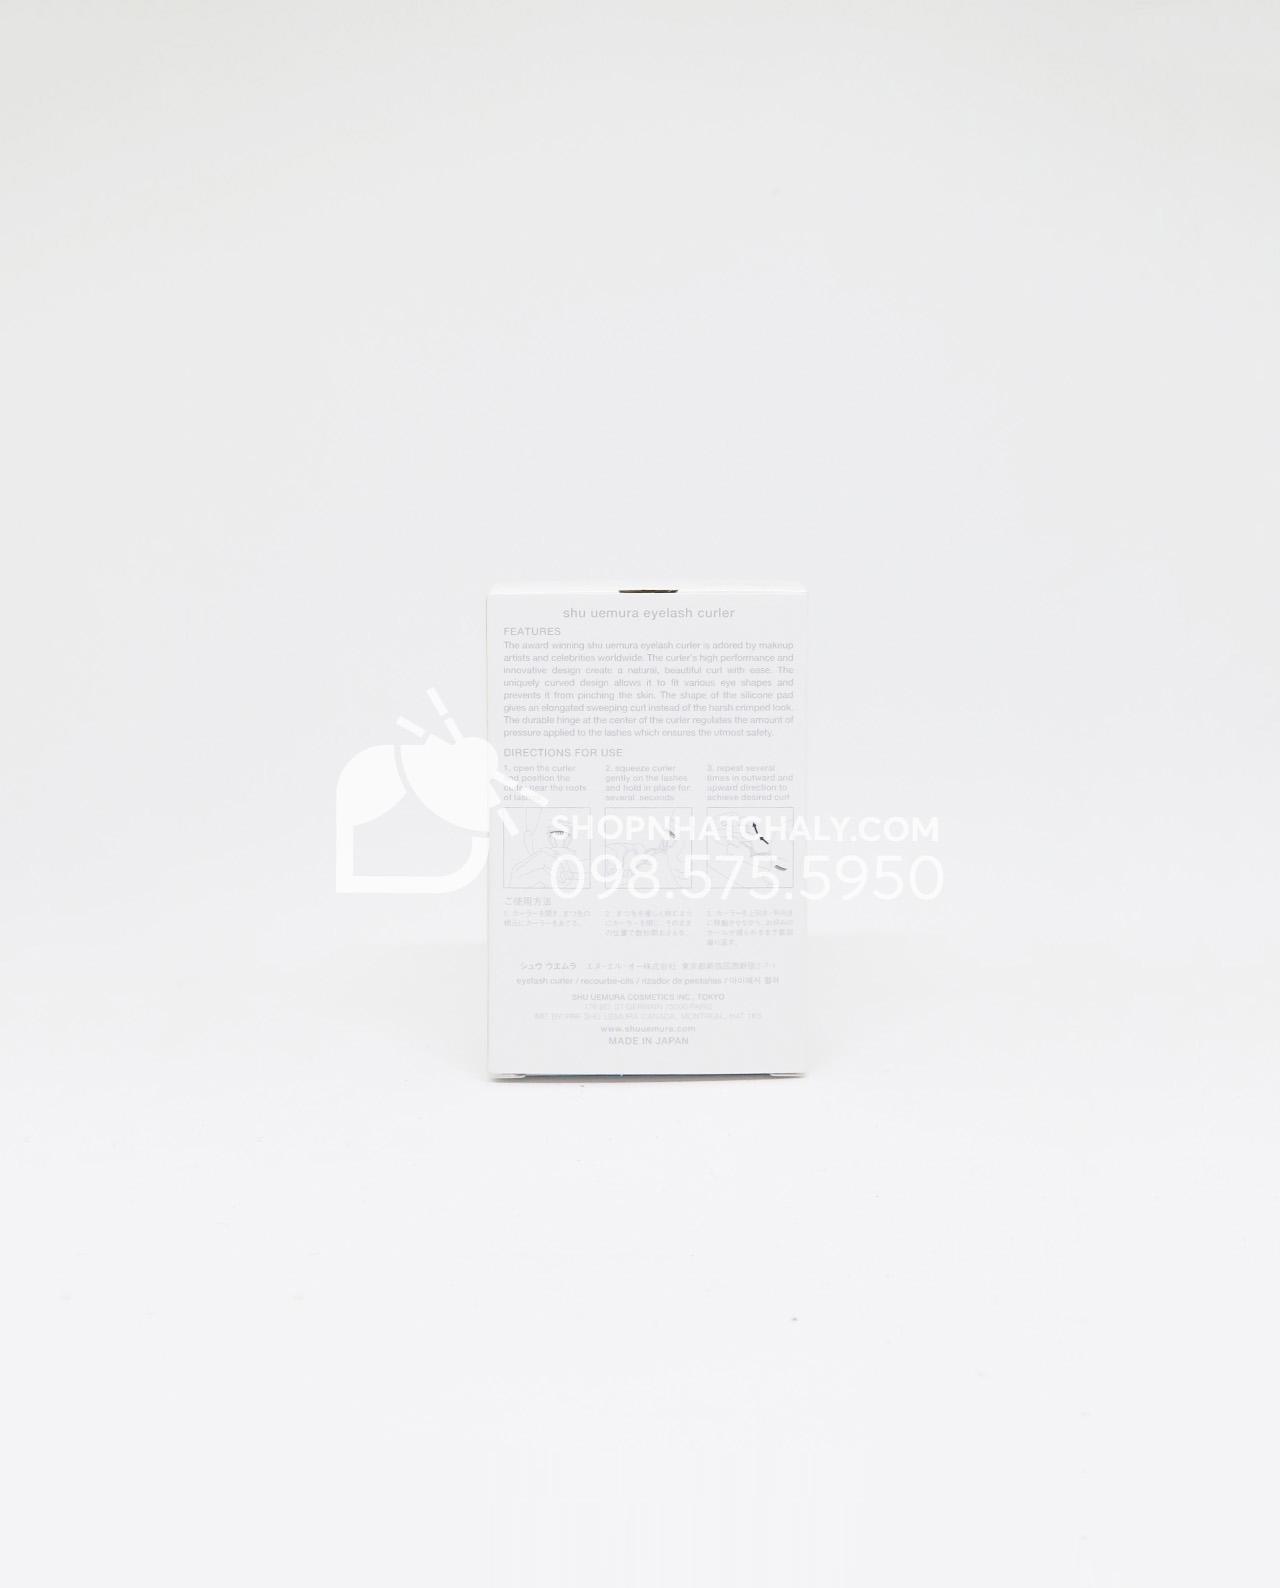 Kẹp mi Shu Uemura Eyelash Curler - thông tin sản phẩm